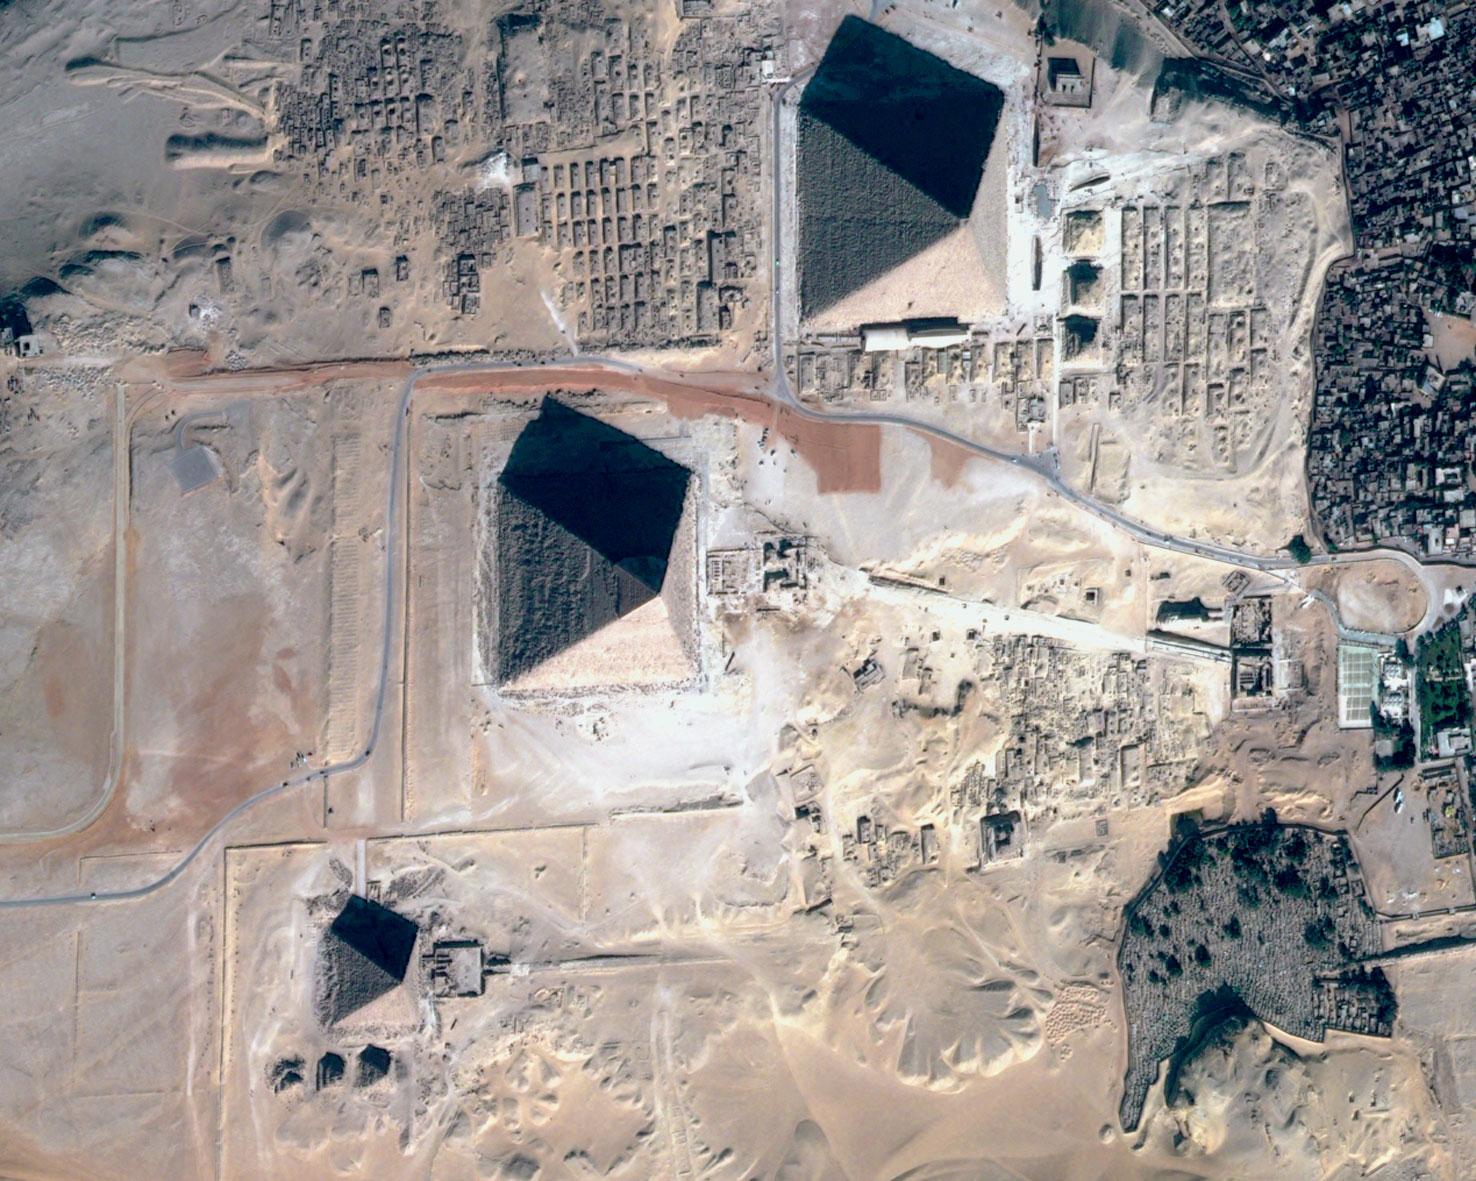 пирамиды египта фото со спутника пришла беда